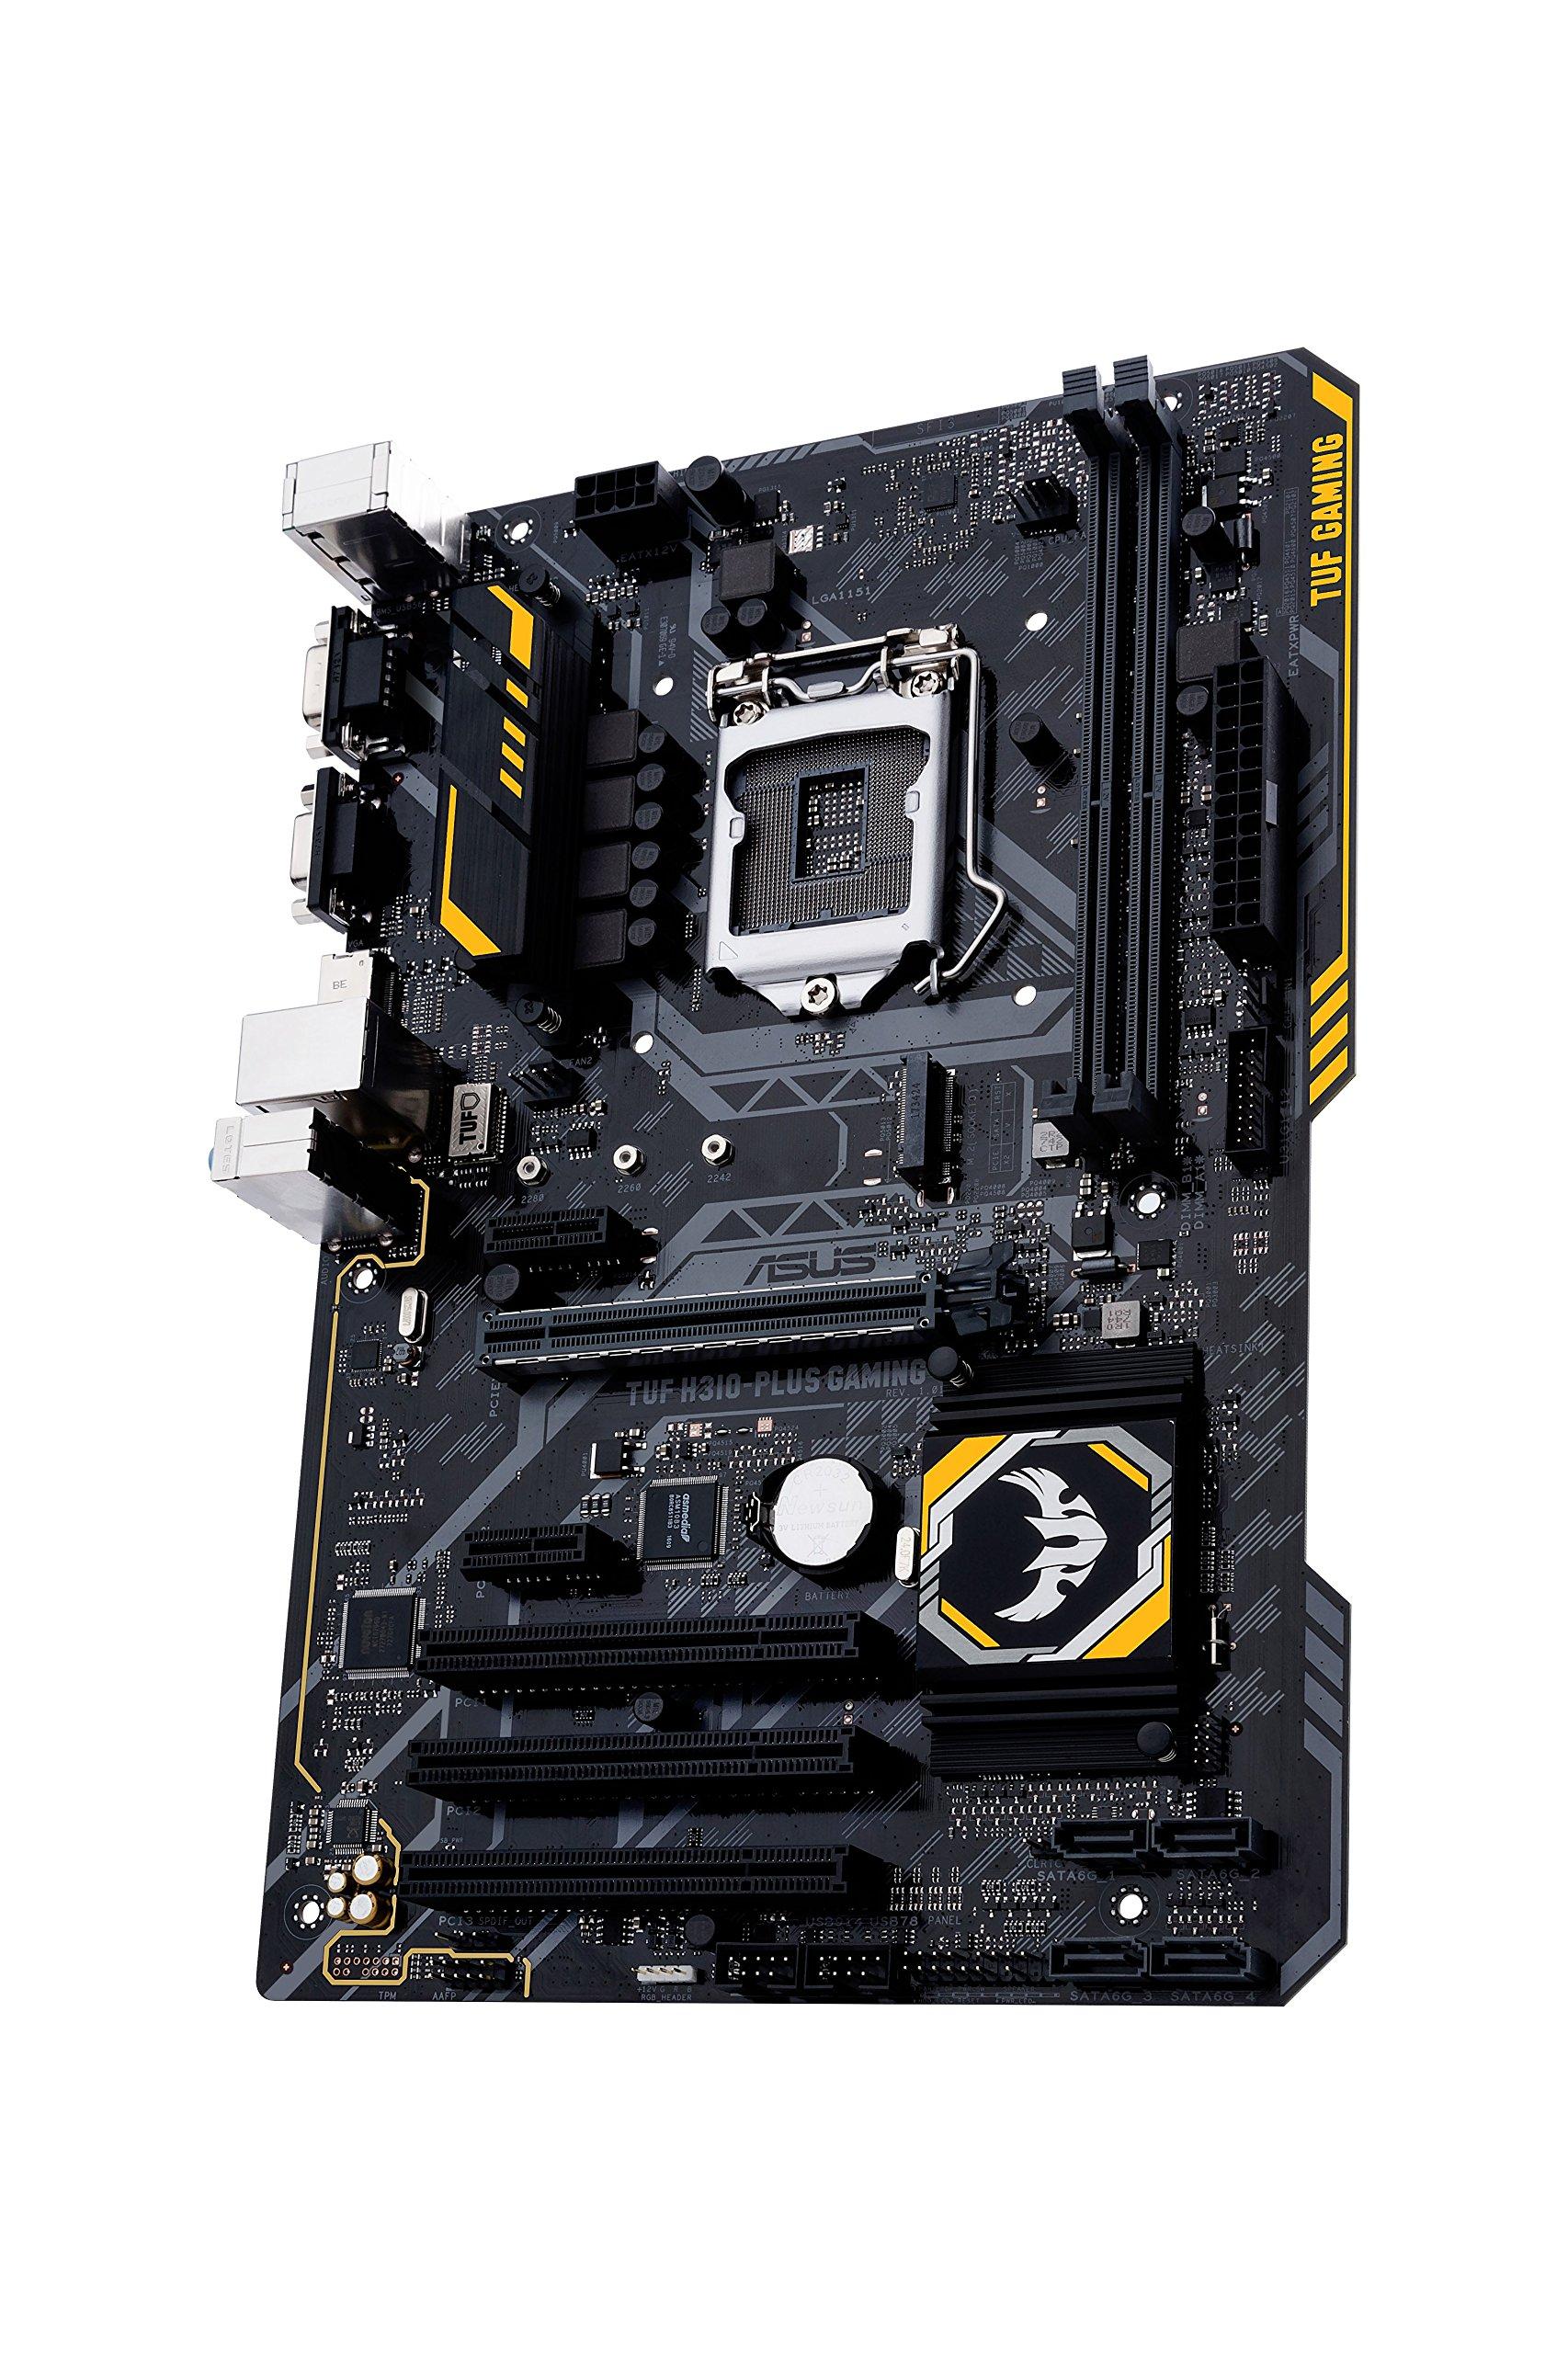 ASUS TUF H310-Plus Gaming LGA1151 (Intel 8th Gen) DDR4 HDMI VGA M.2 B360 ATX Motherboard